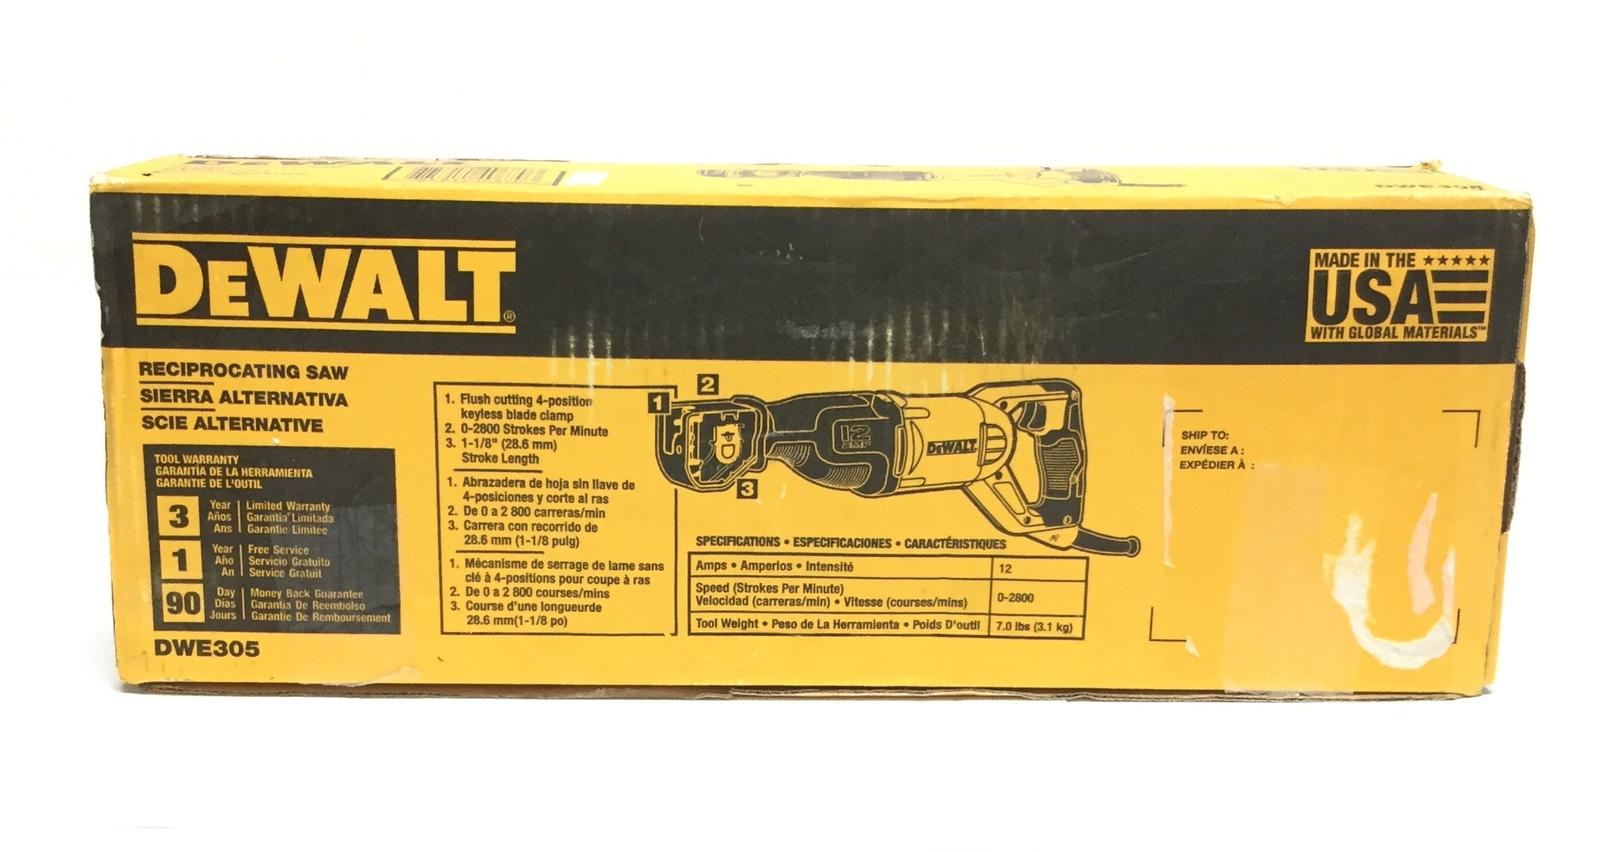 Dewalt Corded Hand Tools Dwe305 image 2